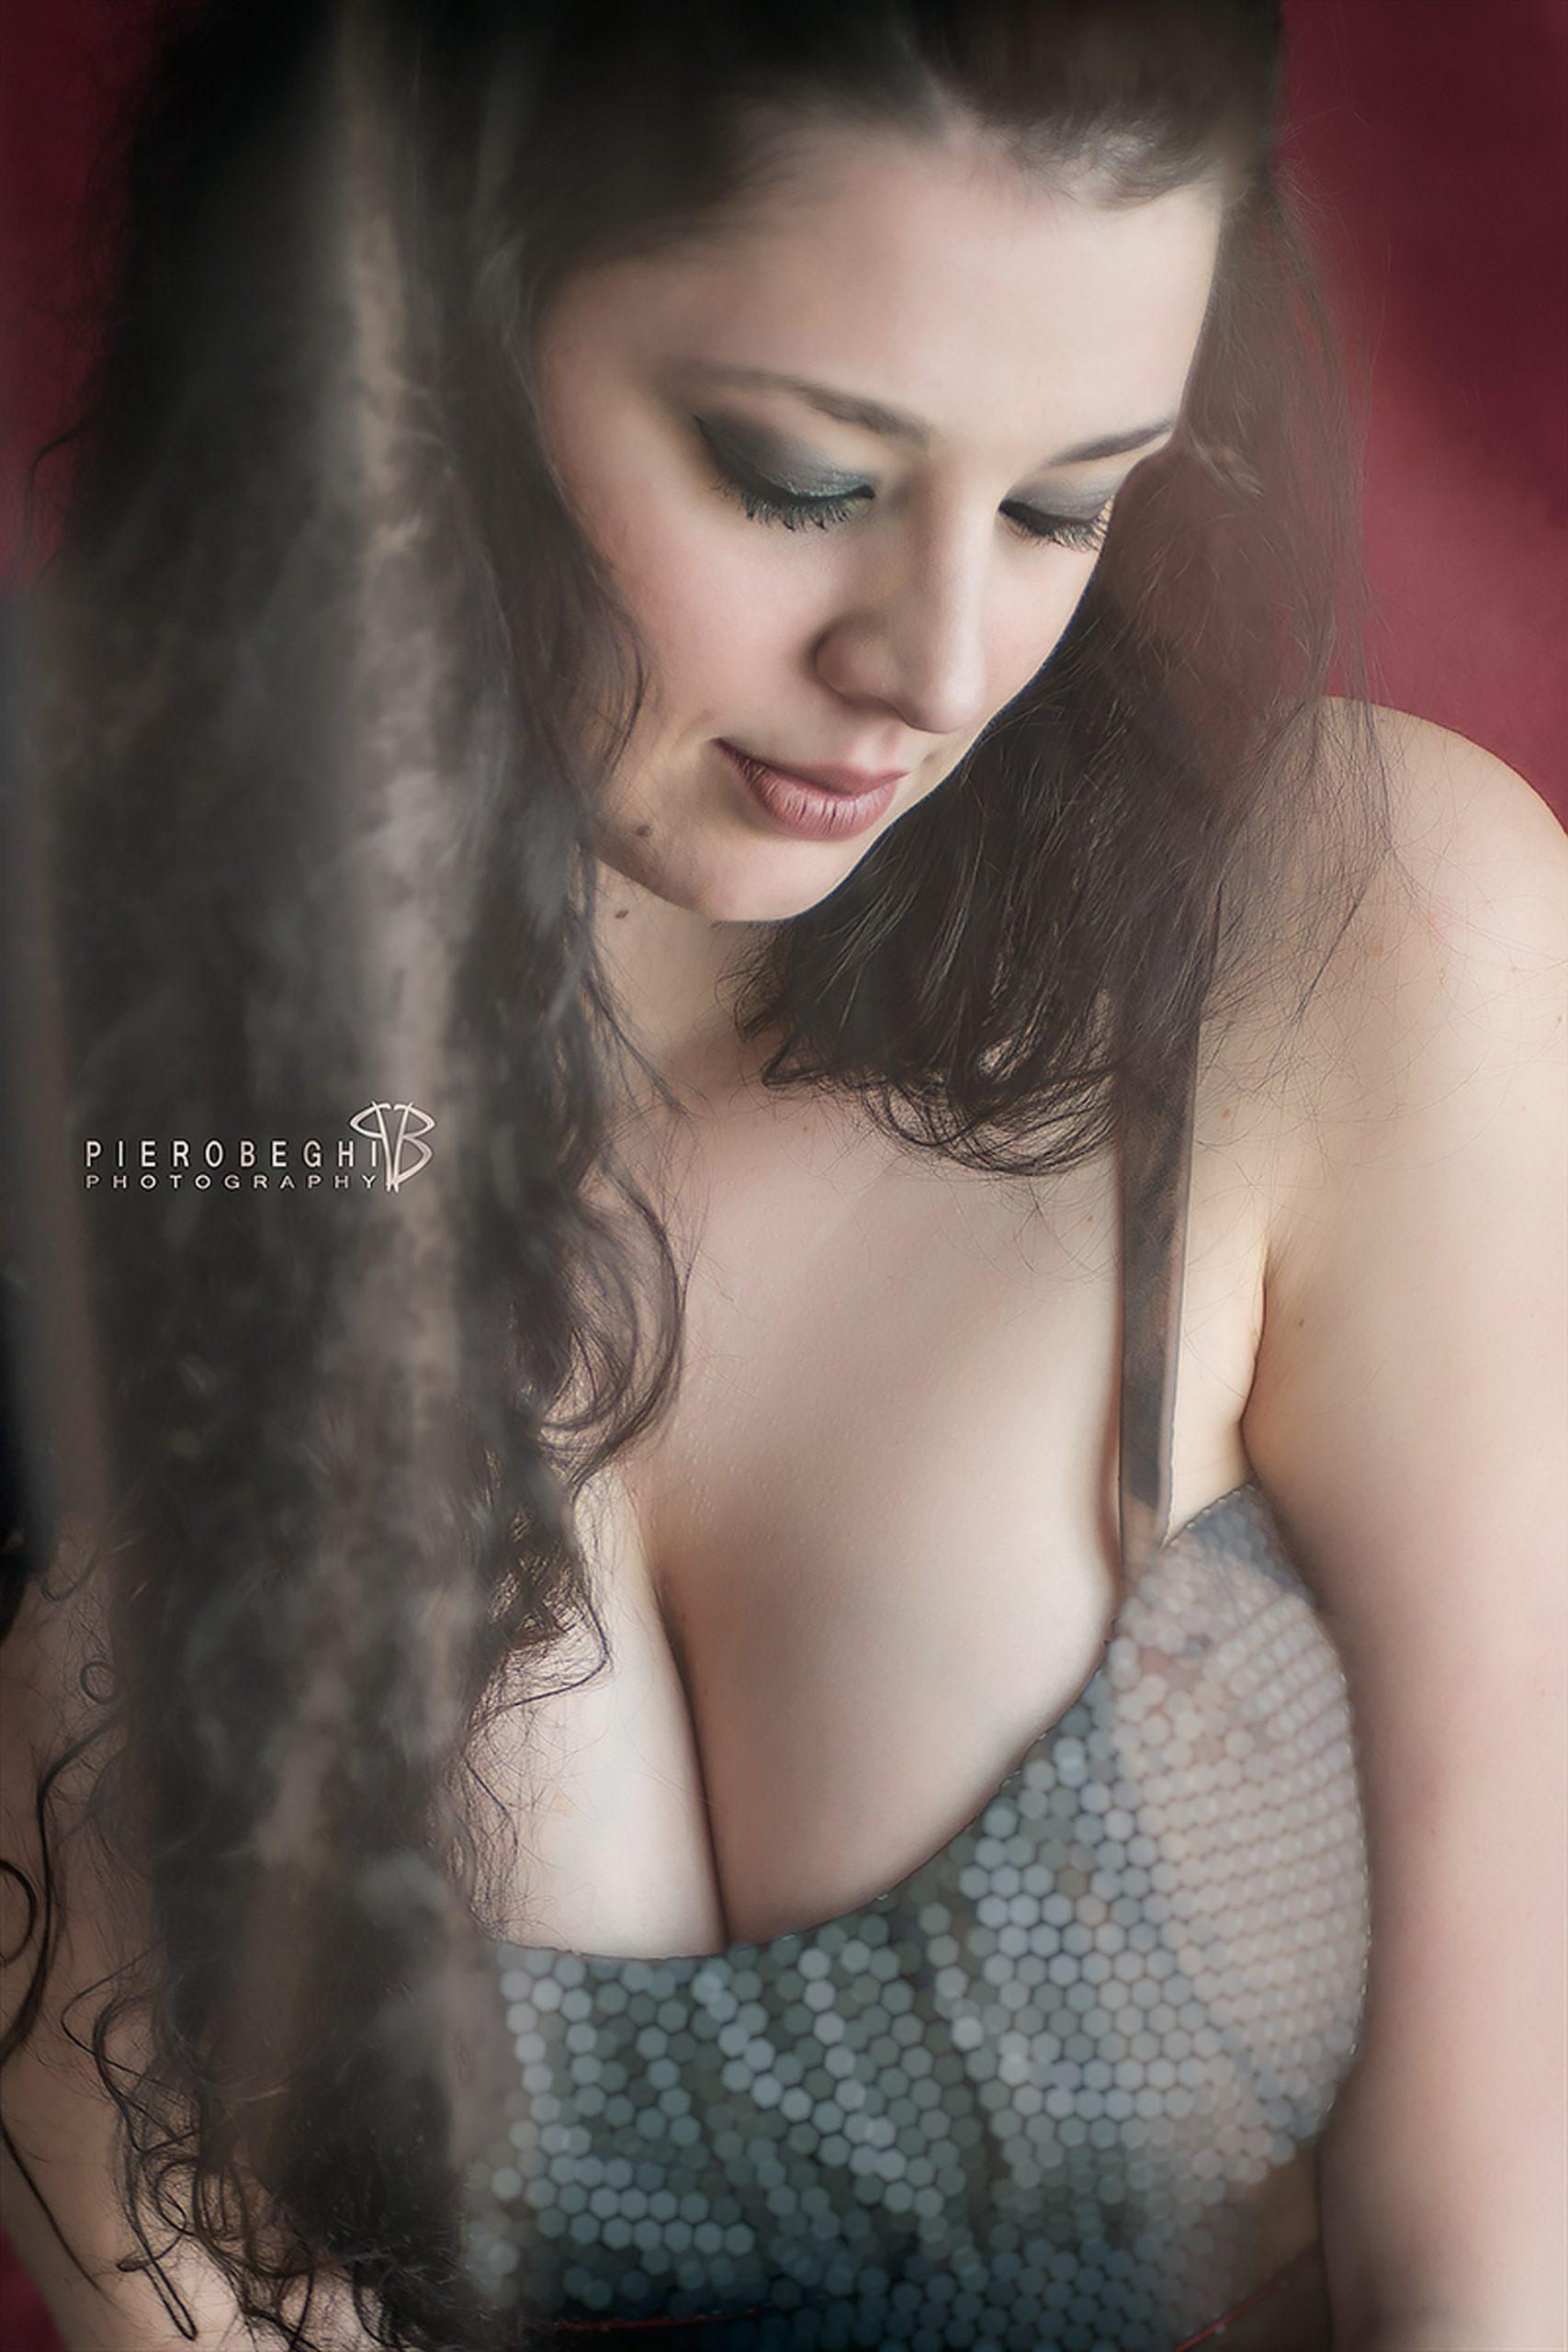 Categorie: Boudoir & Nude, Glamour, Portrait; Photographer: PIERO BEGHI; Model: IMY; Location: Ghedi, BS, Italia